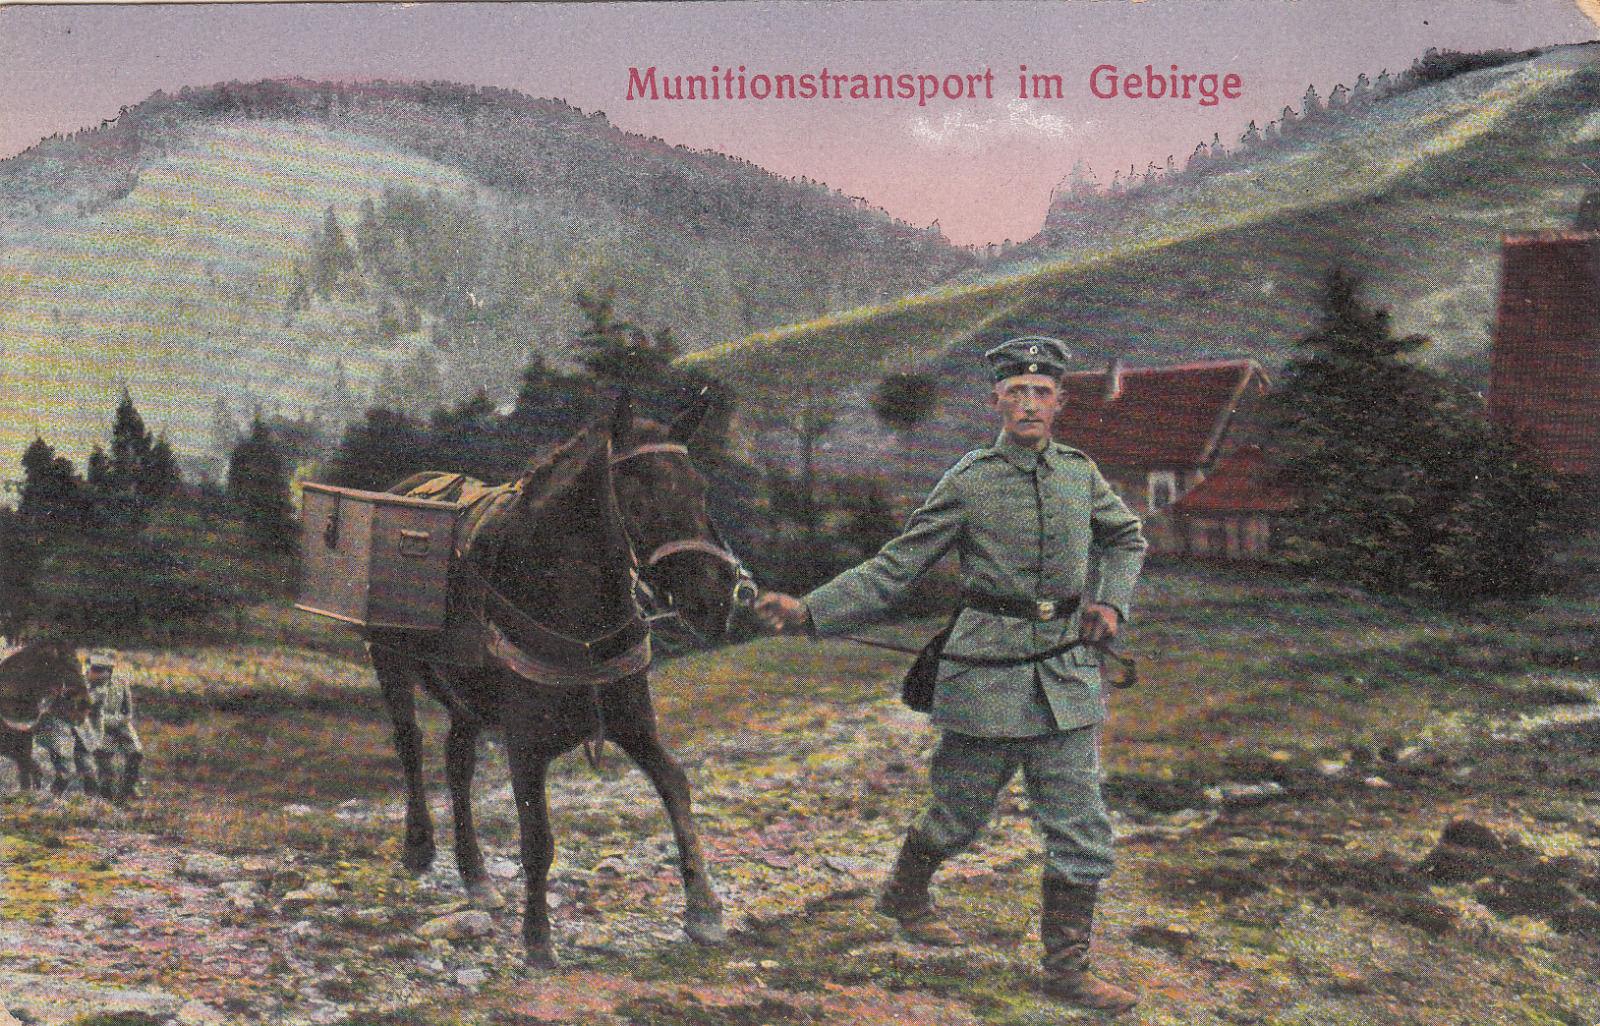 alte-AK-Feldpost-Munitionstransport-im-Gebirge-Pferde-ca.jpg